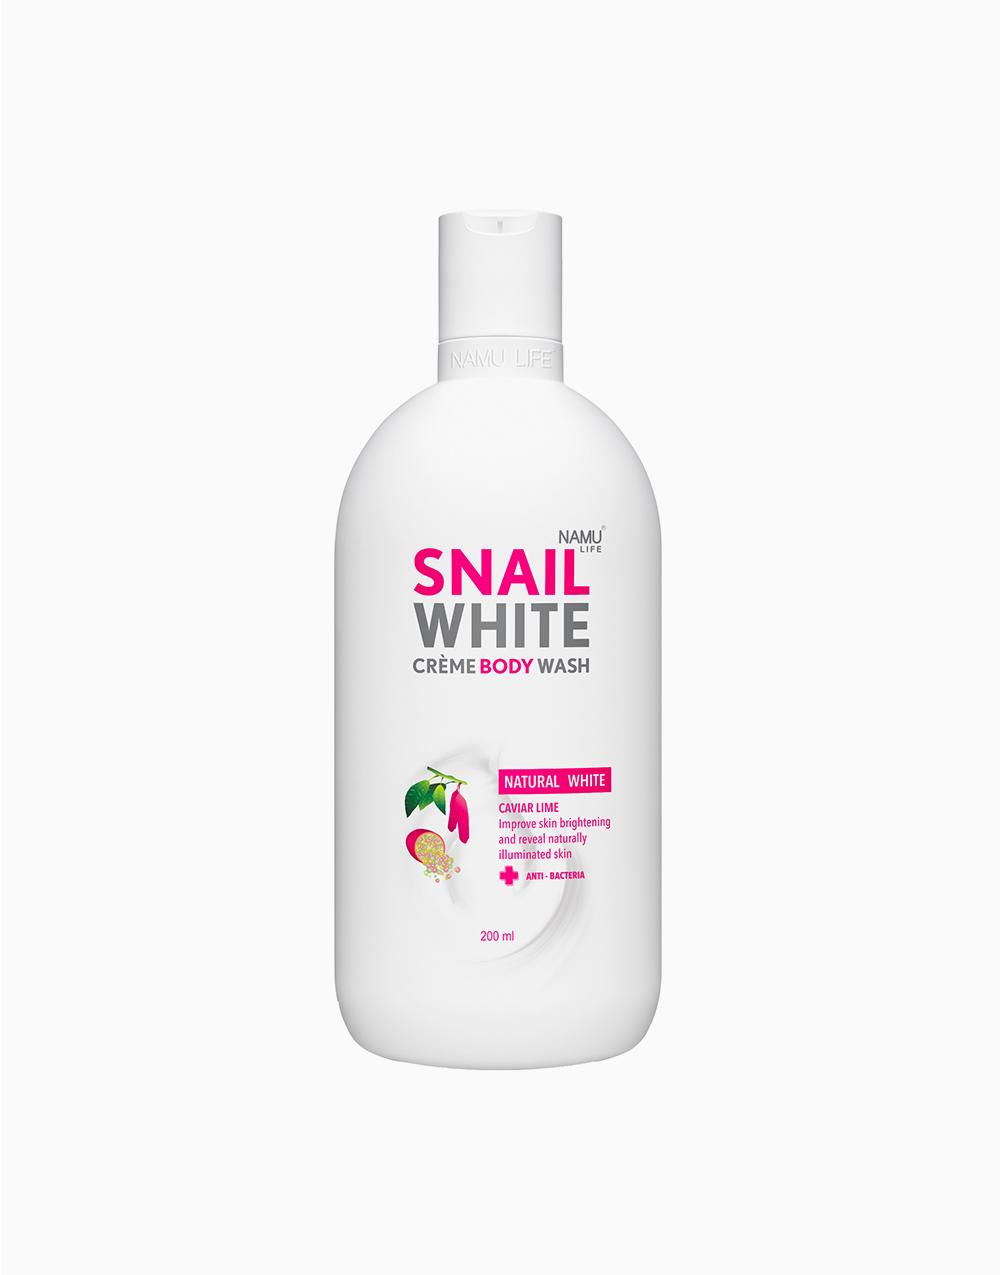 Natural White Body Wash (200ml) by SNAILWHITE